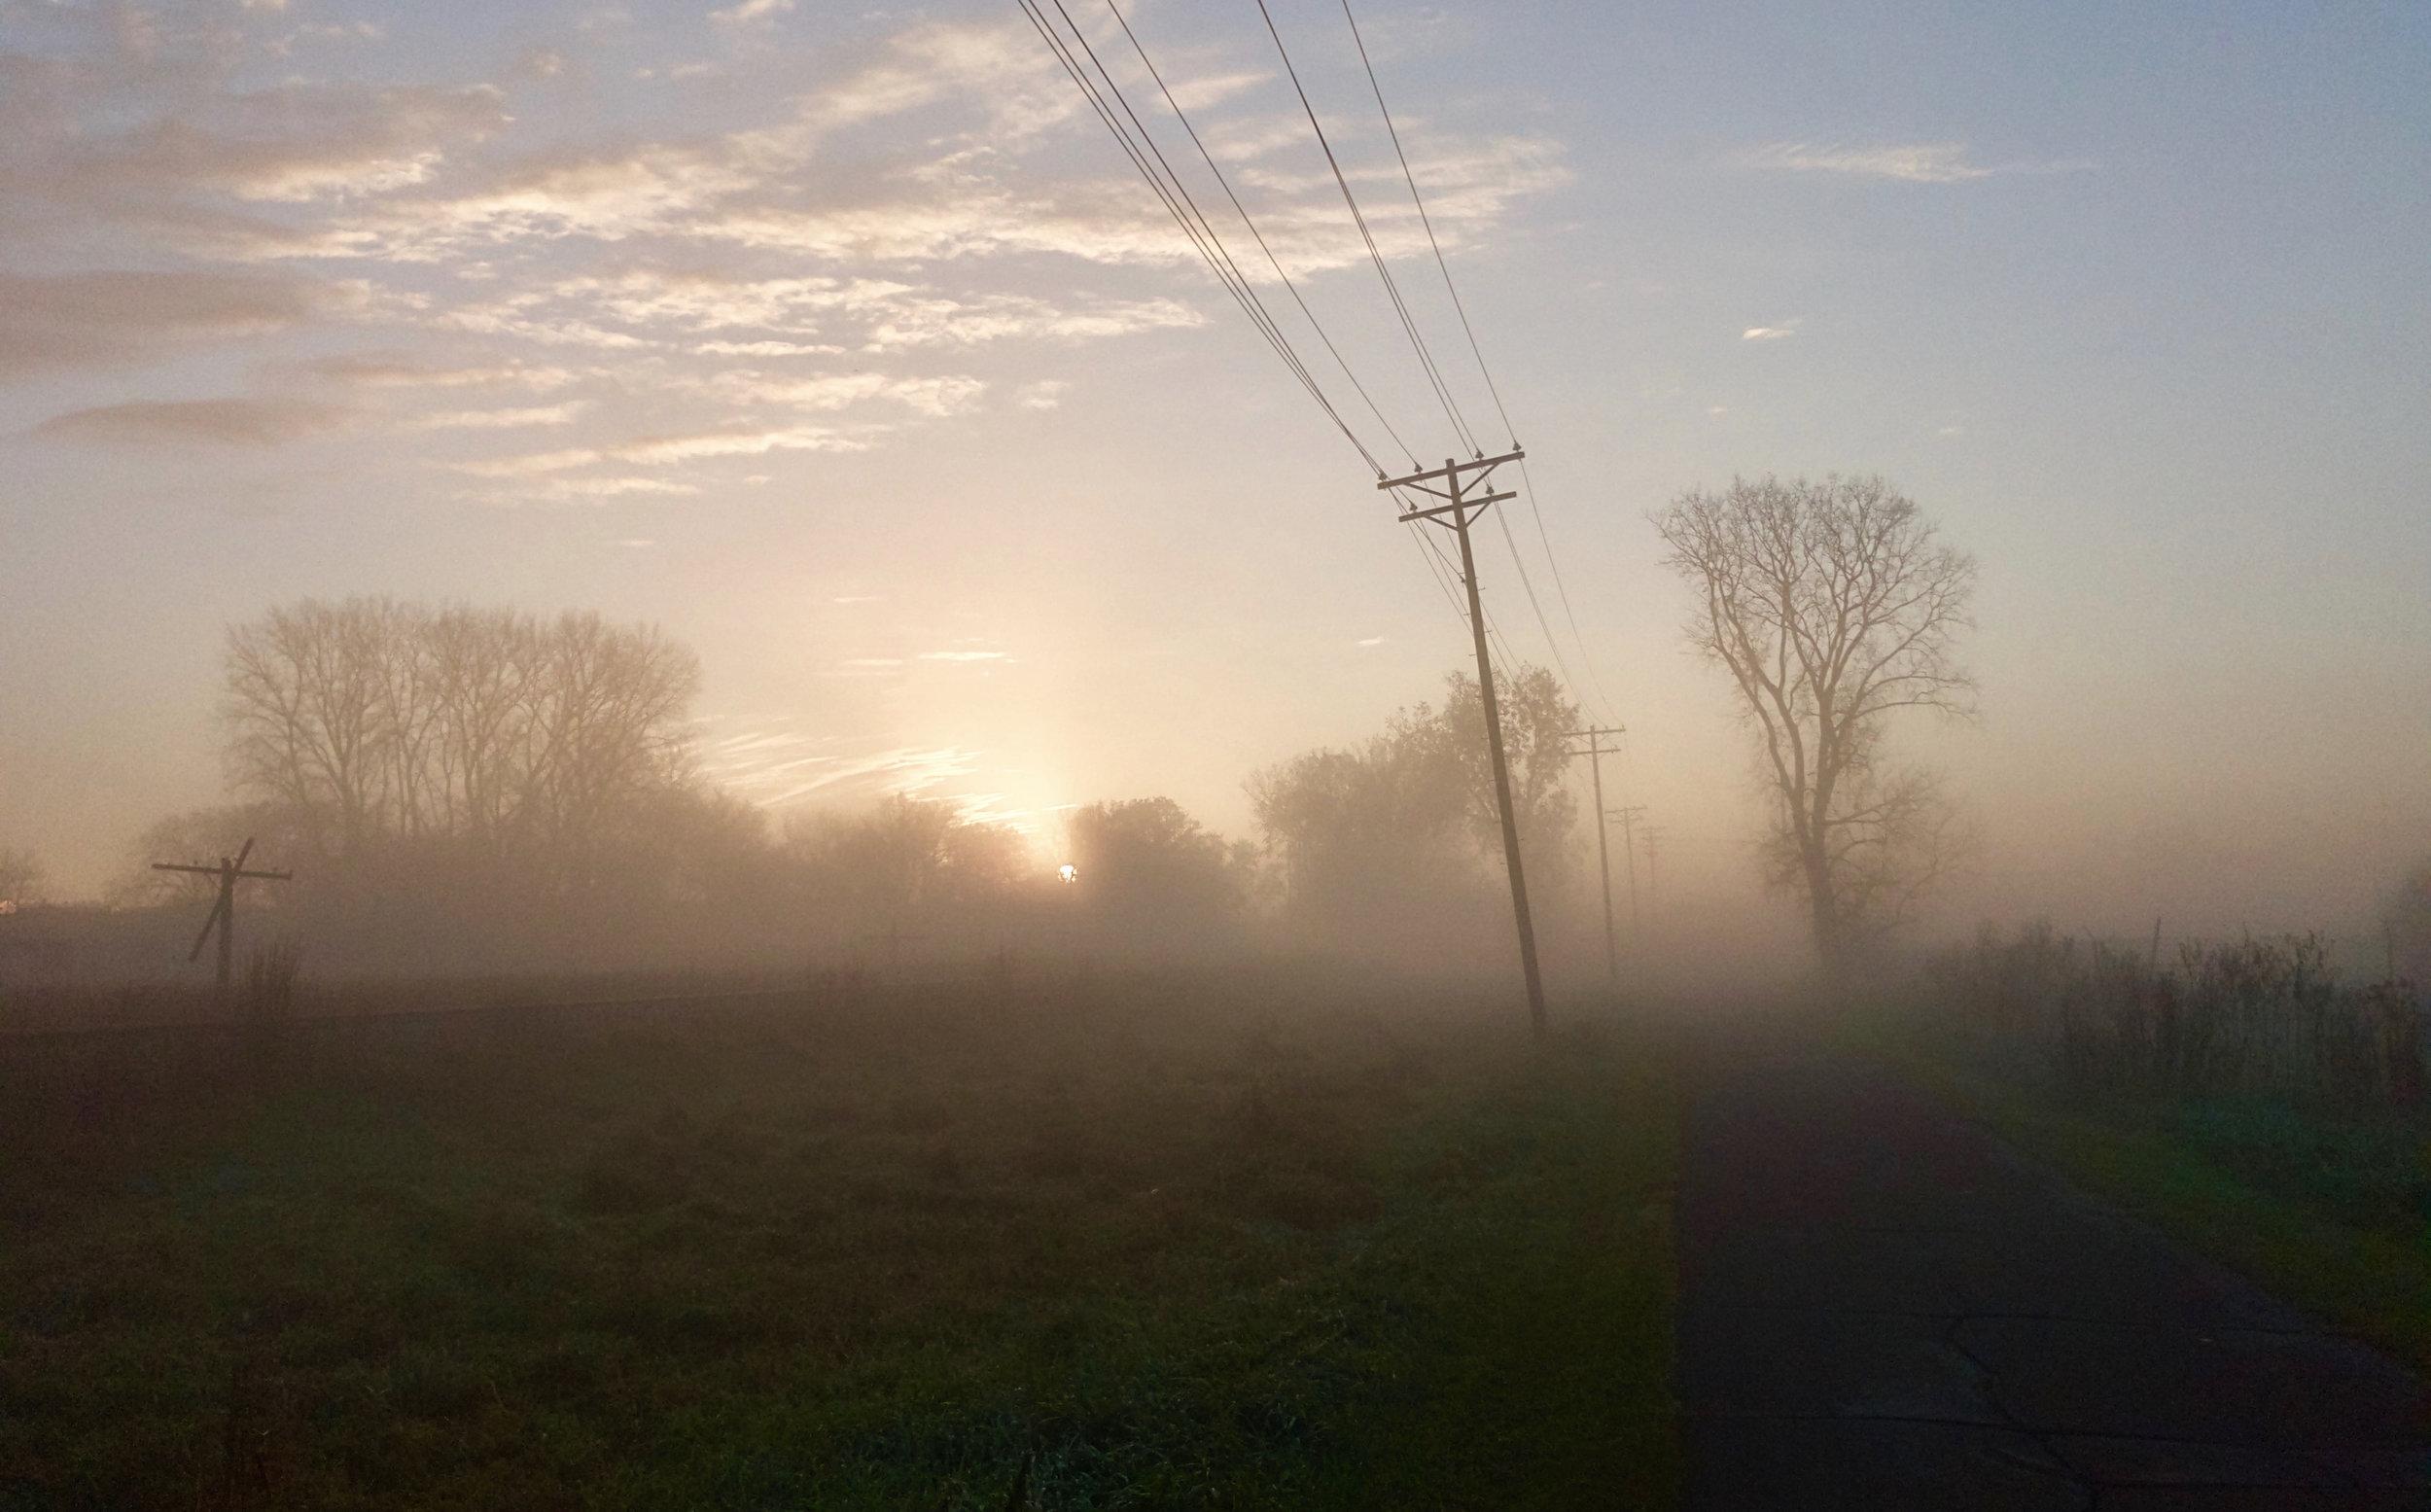 Sunrise. Capital City Trail. Madison, Wisconsin. November 2016. © William D. Walker